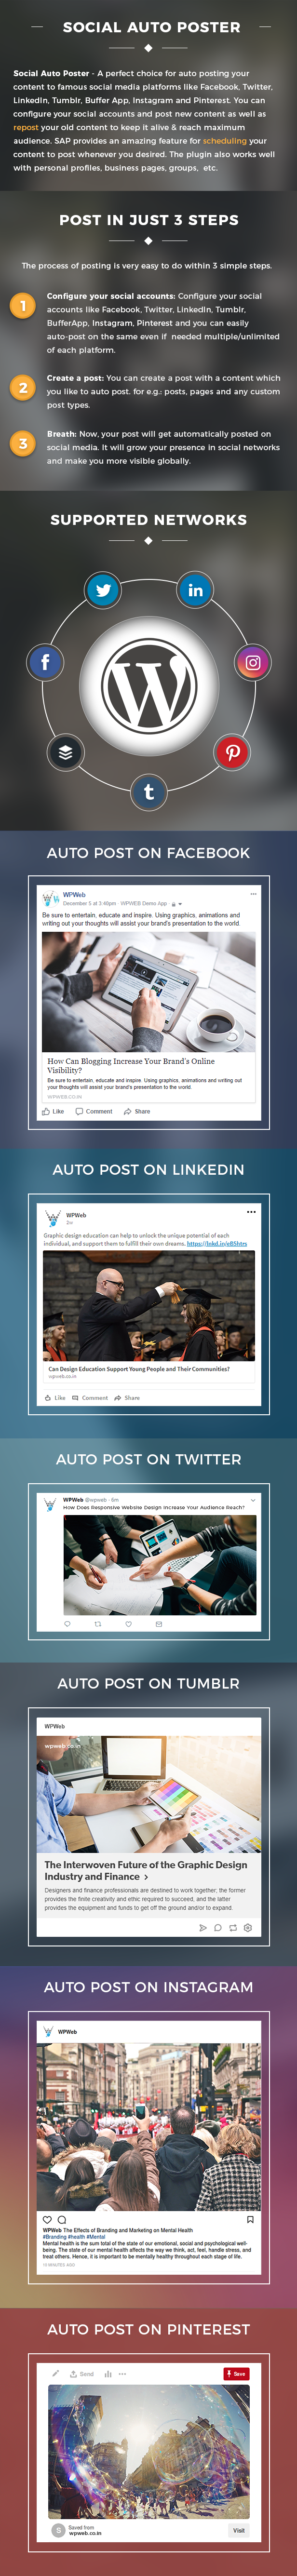 social2 3 - Social Auto Poster - WordPress Plugin